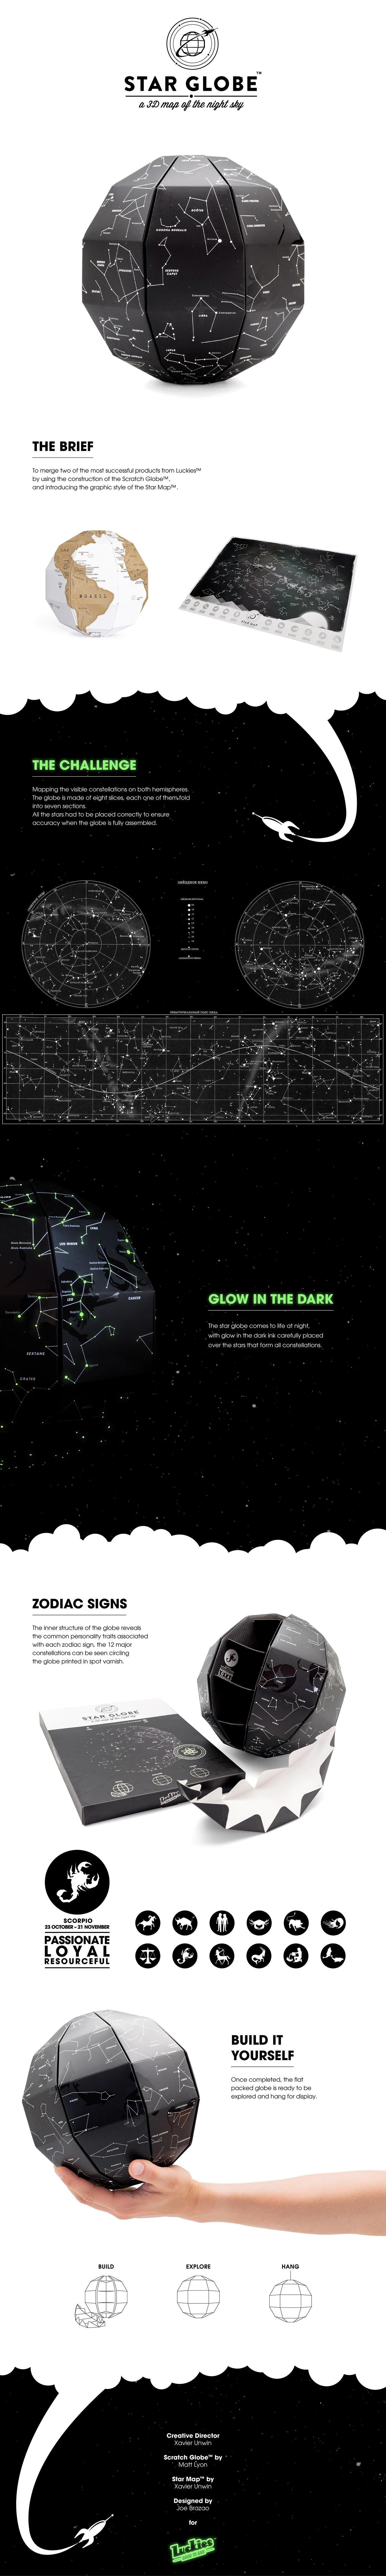 star globe glow in dark Constellations zodiac map Star Map